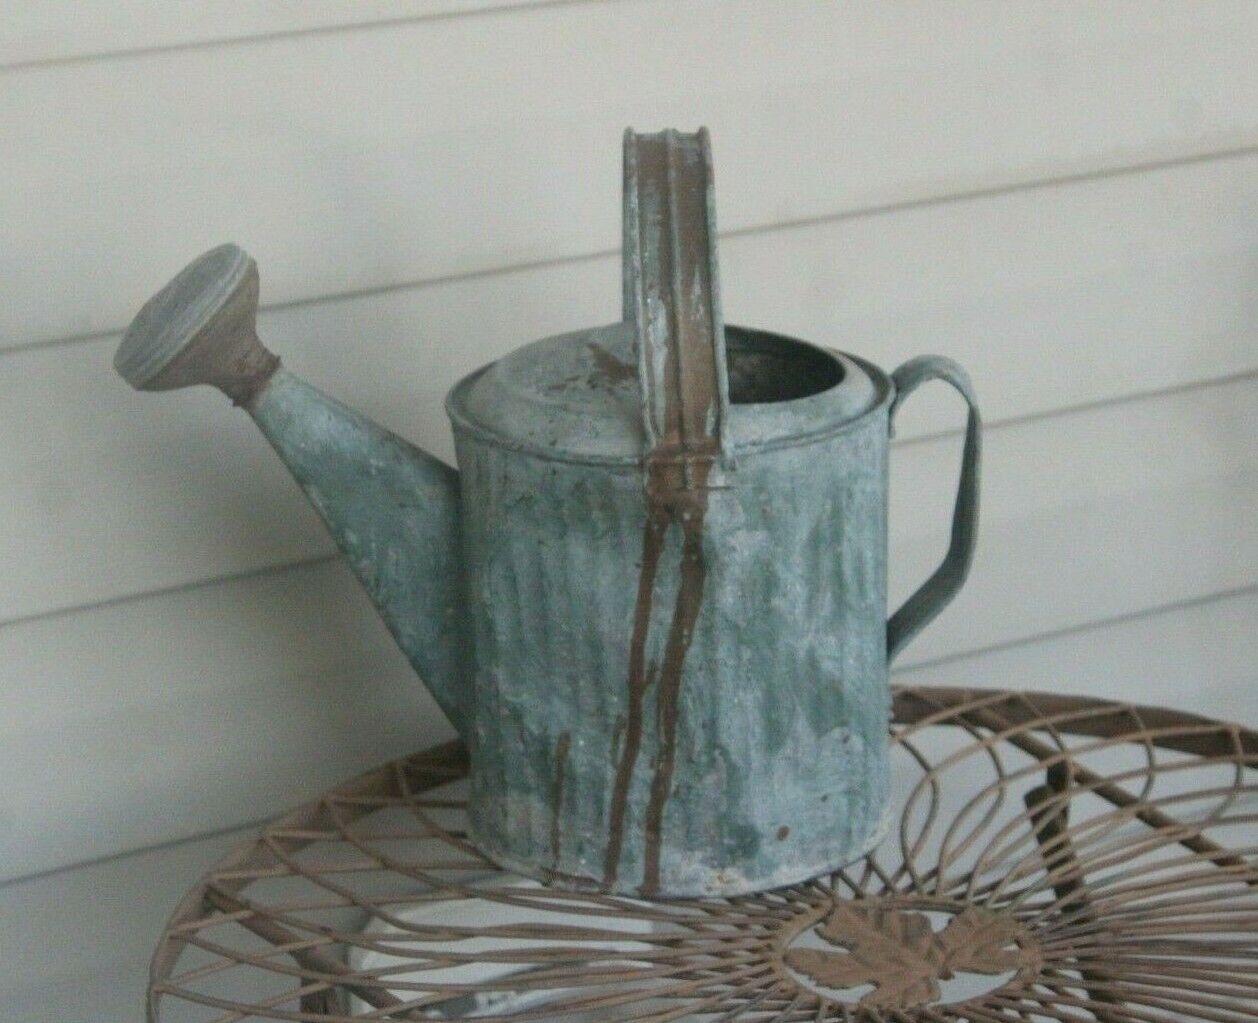 Vintage Galvanized Garden Watering Can with Sprinkler Head ~ Works Great